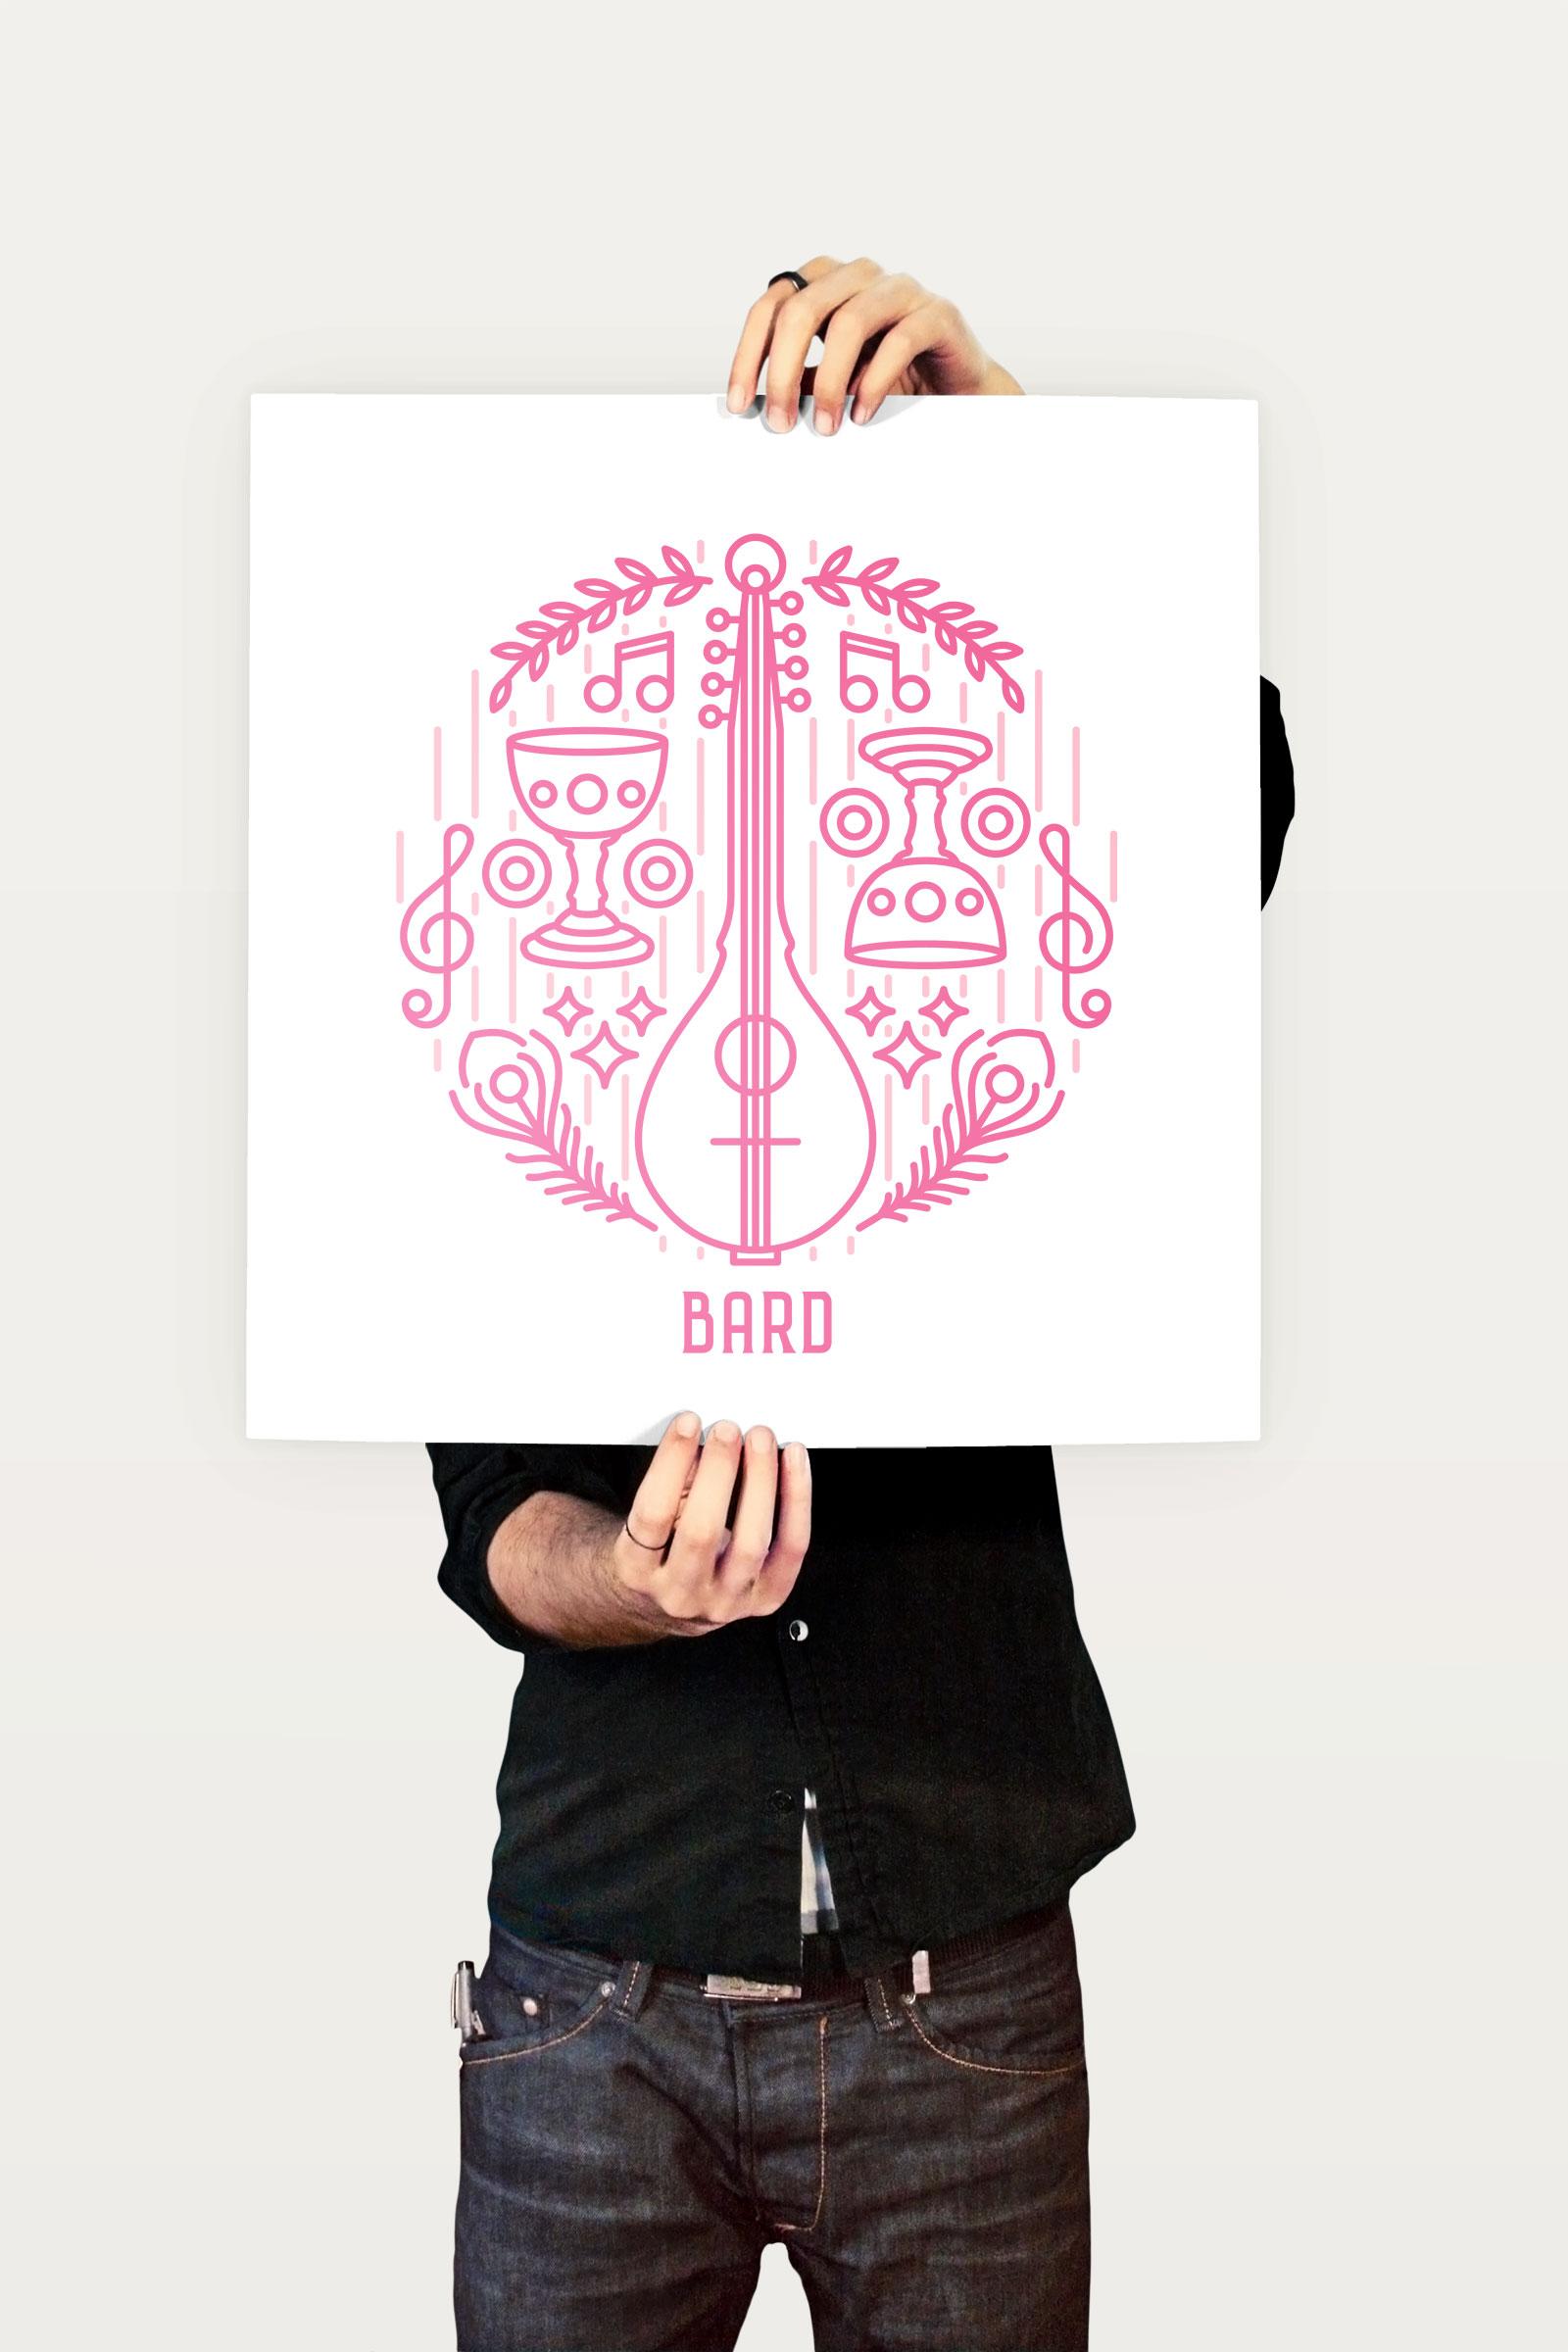 bard-poster.jpg